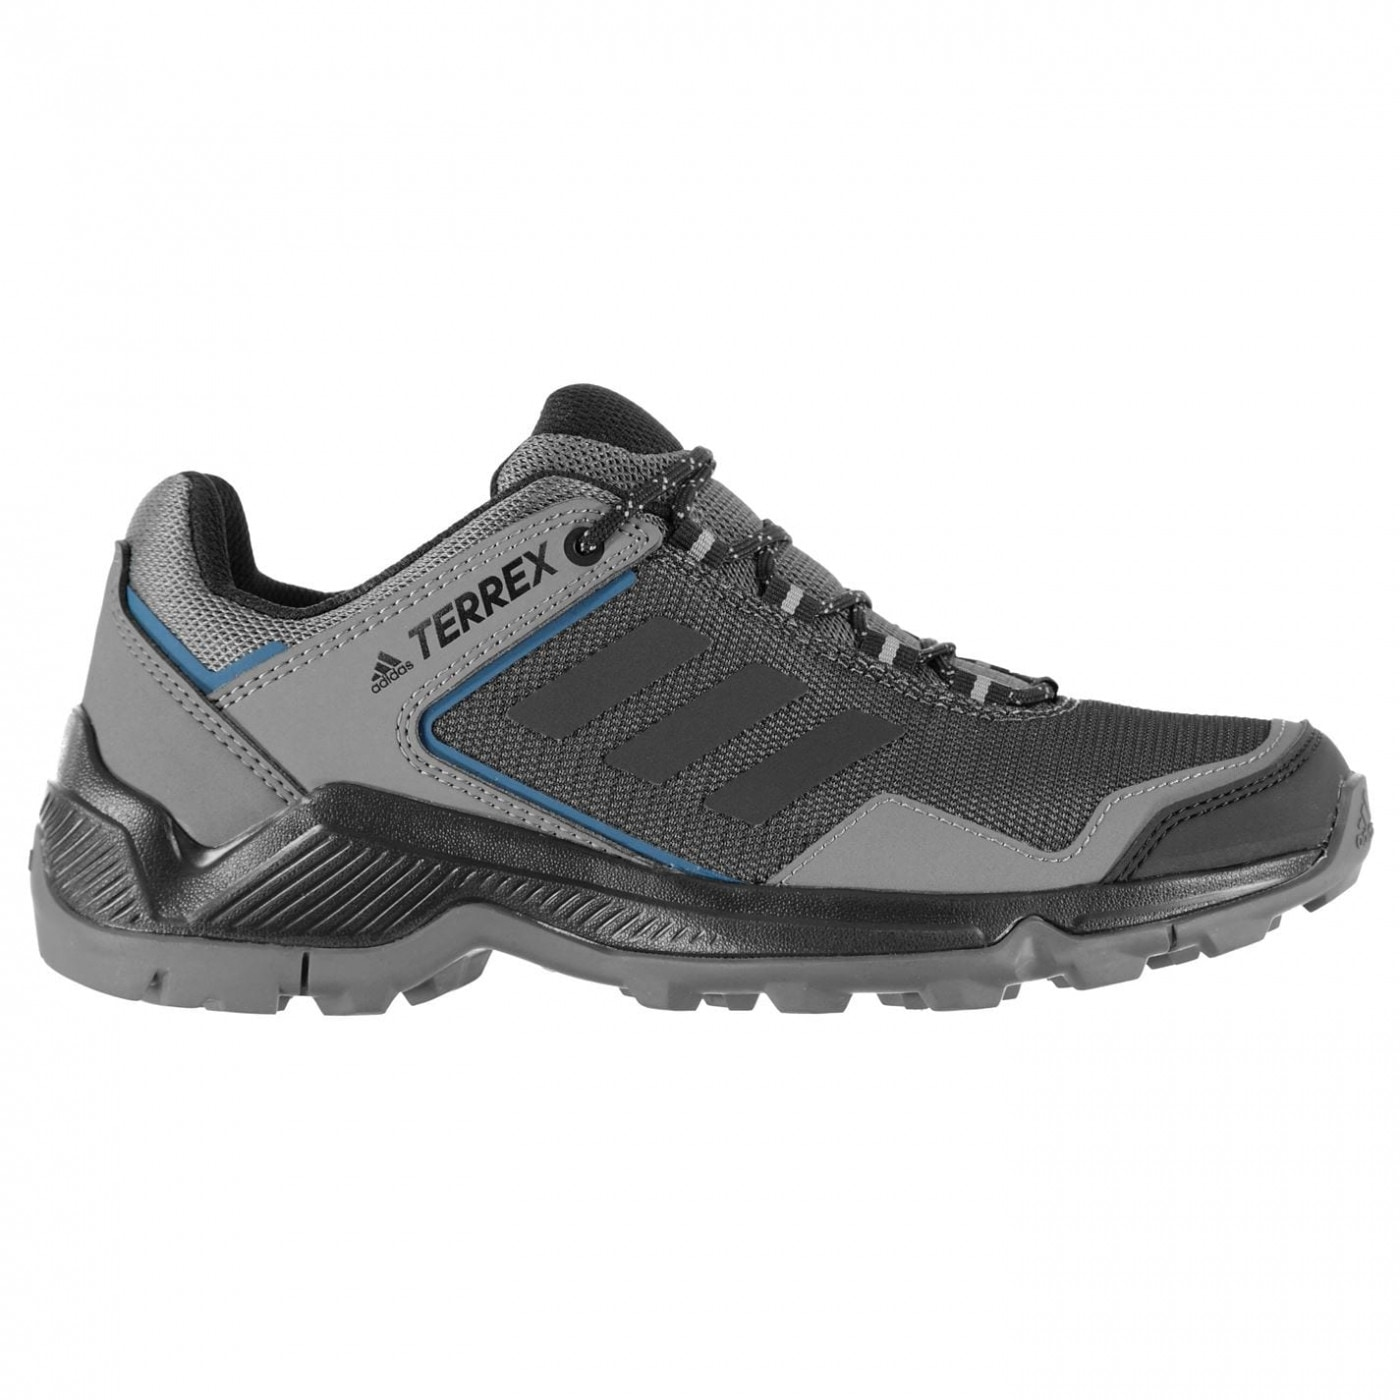 Adidas Terrex Eastrail Mens Walking Shoes